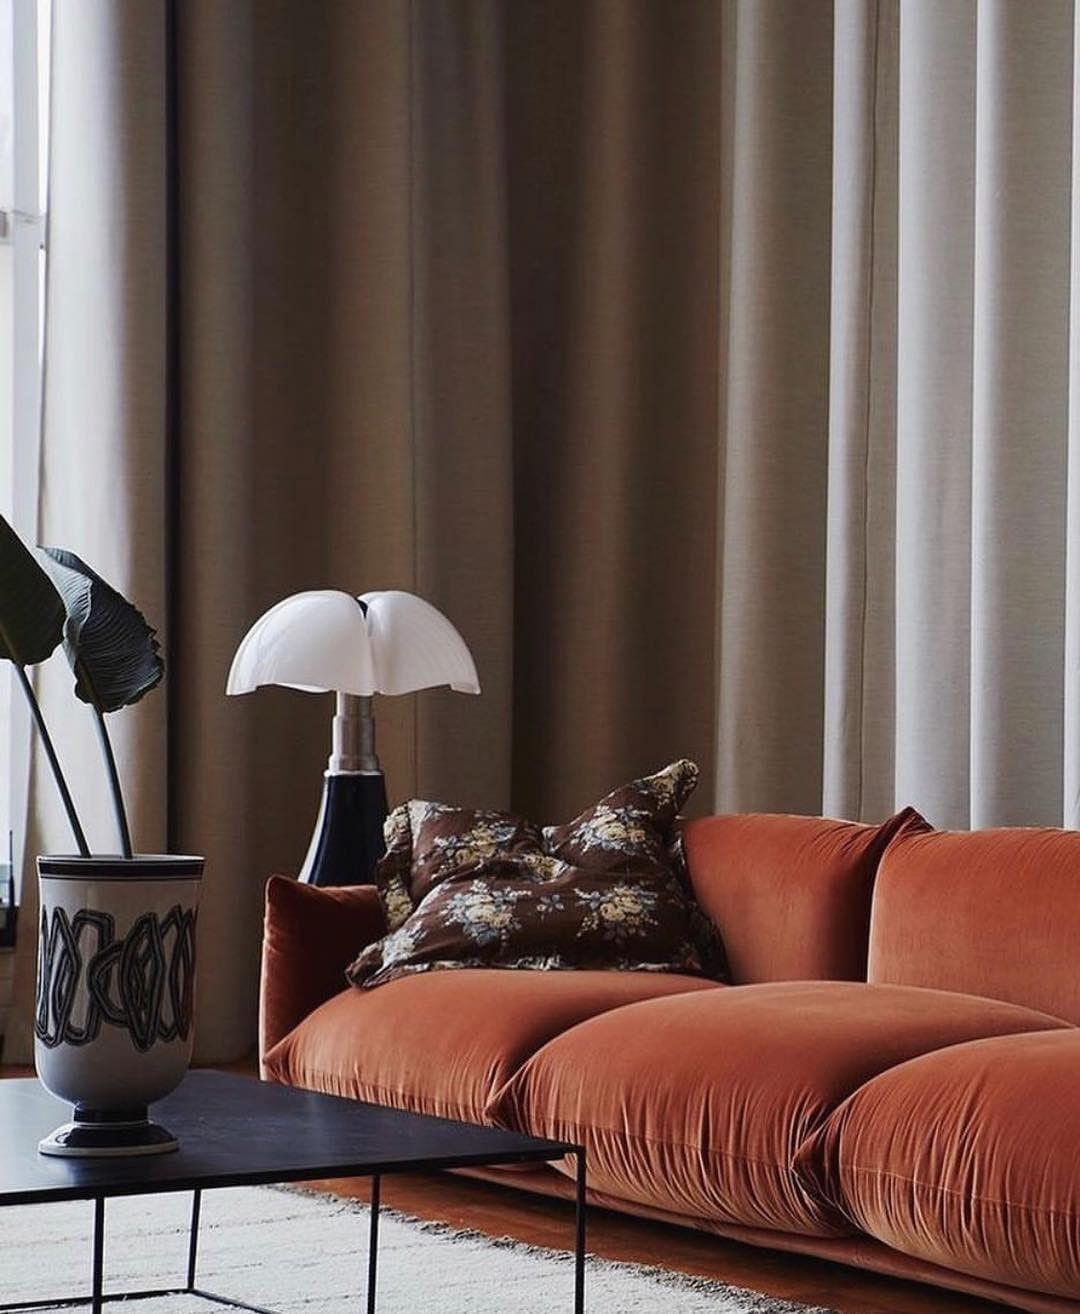 Stunning Burnt Orange Velvet Sofa Look As Those Plump Cushions Mattersofthehome Melaniemorrisinteriors Velve Trending Decor Home Decor Trends Living Decor